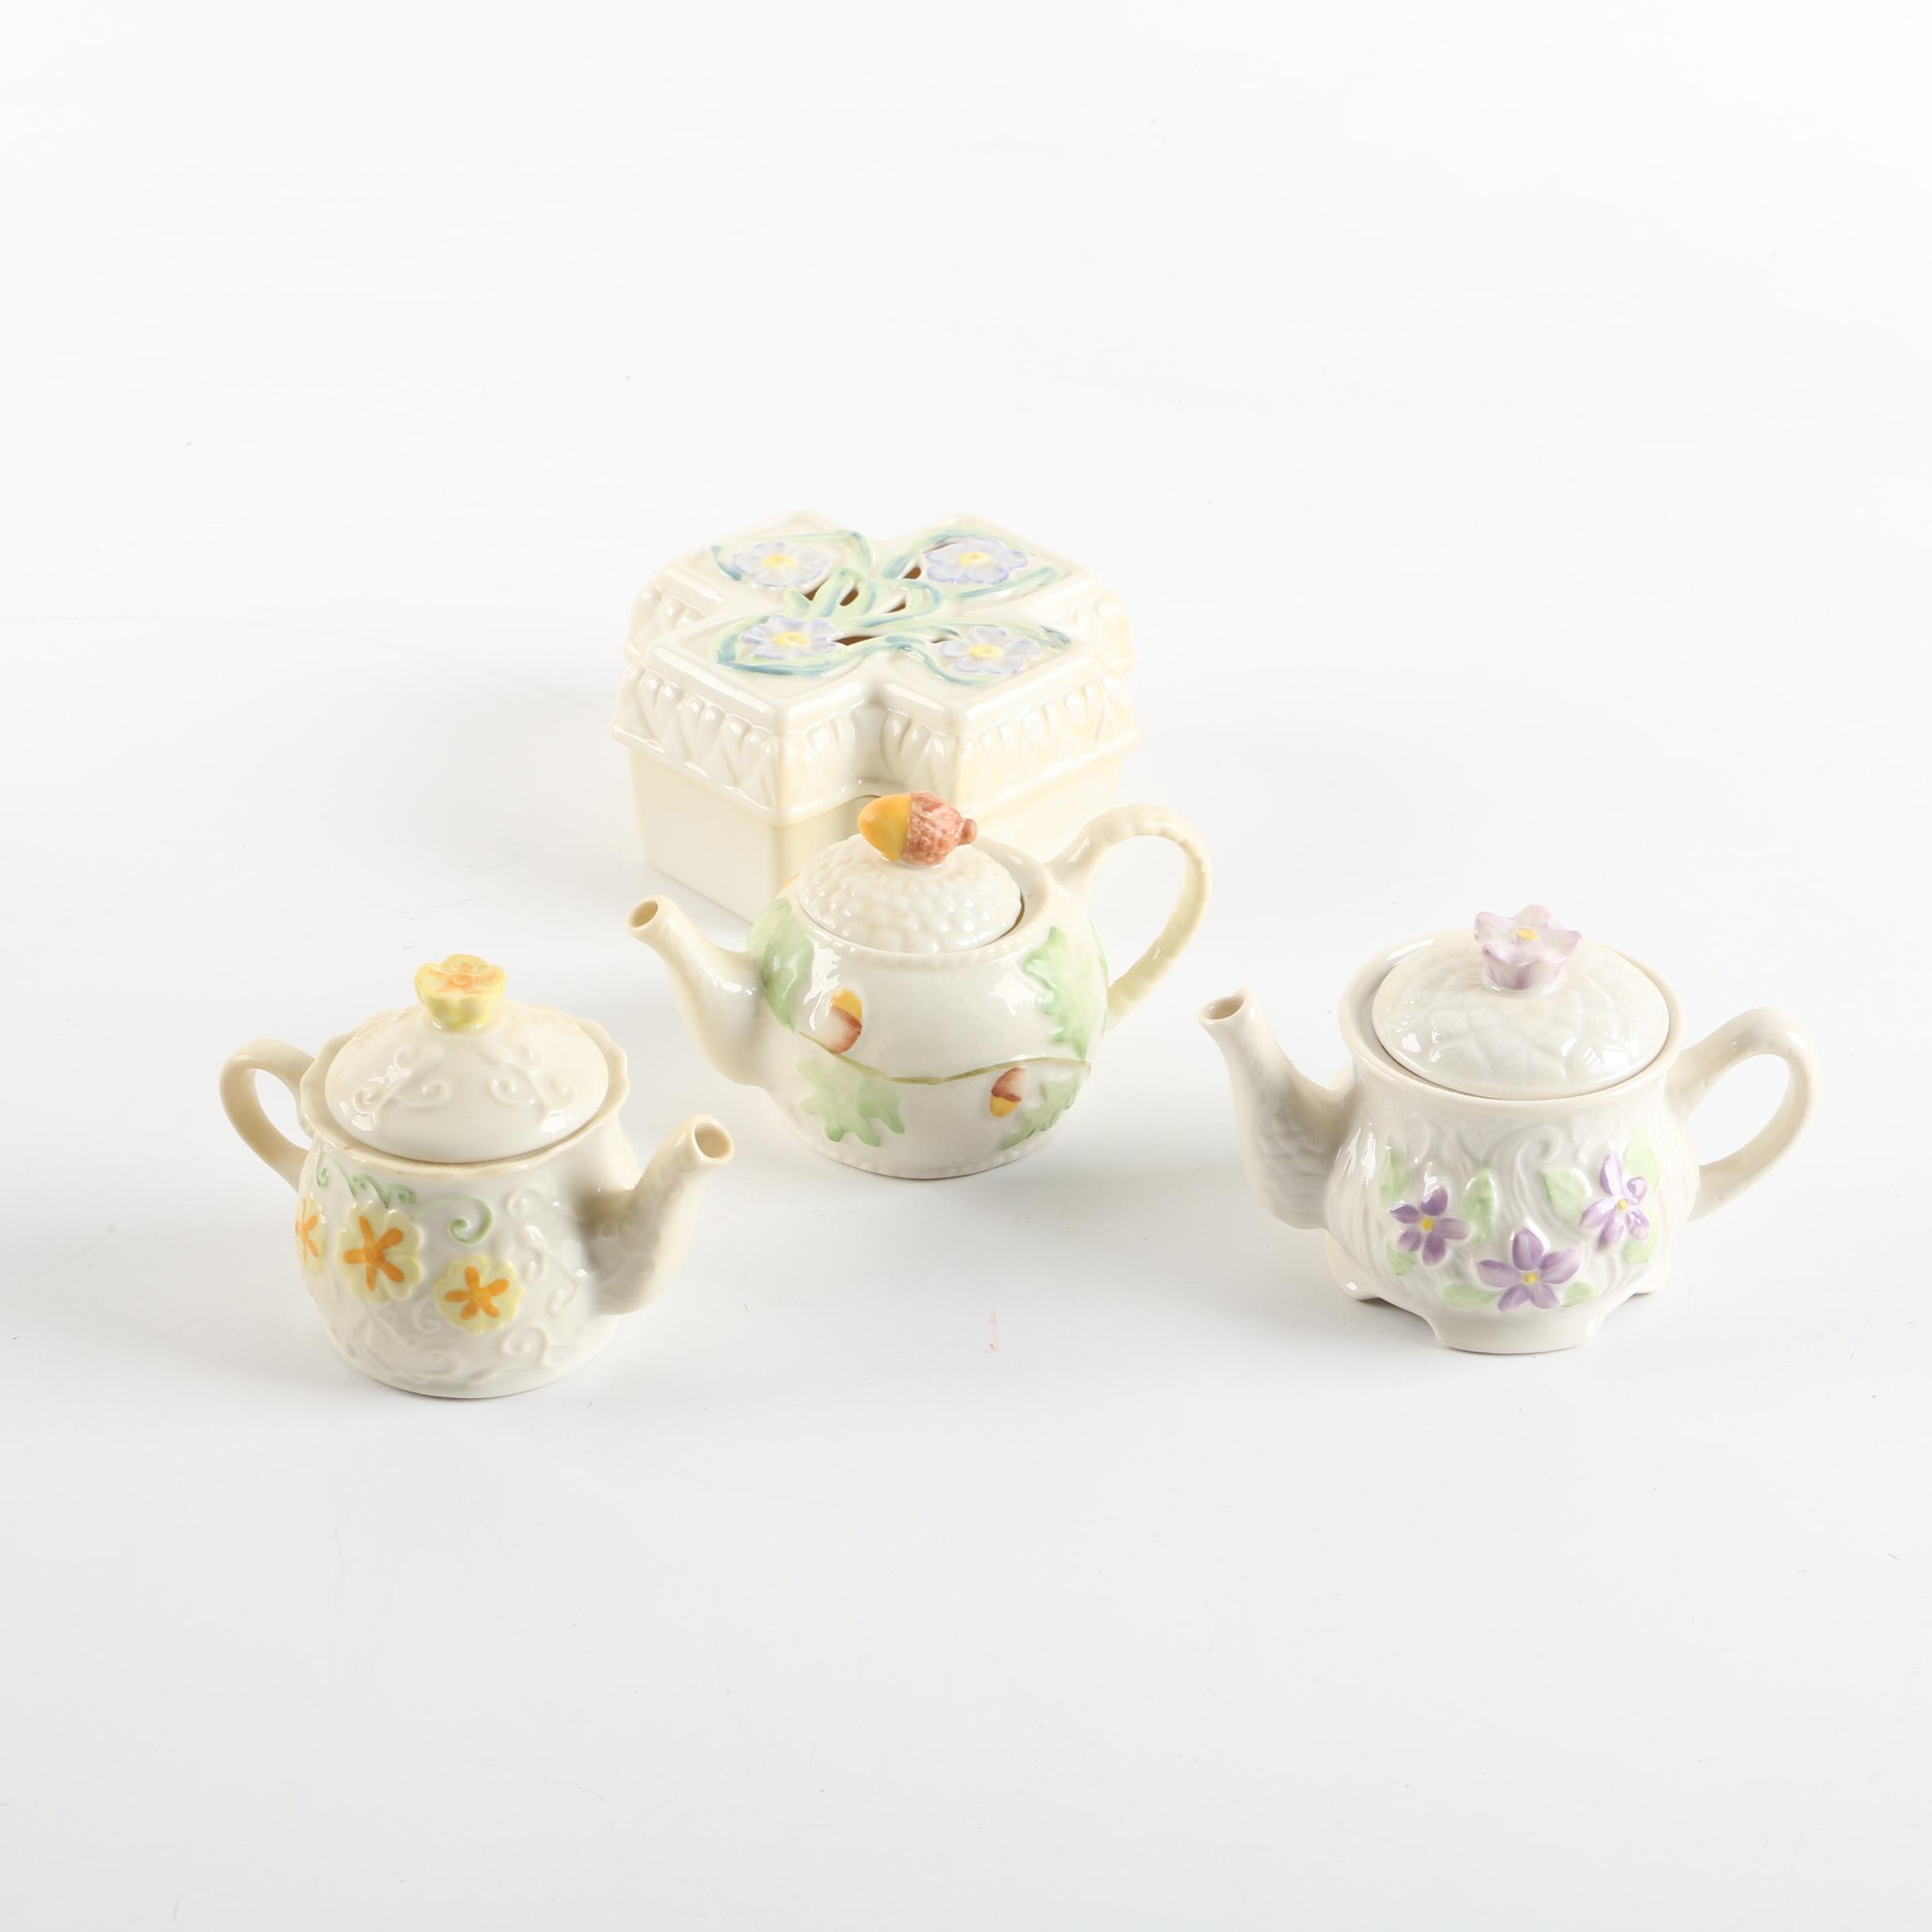 Belleek Teapots and Trinket Box